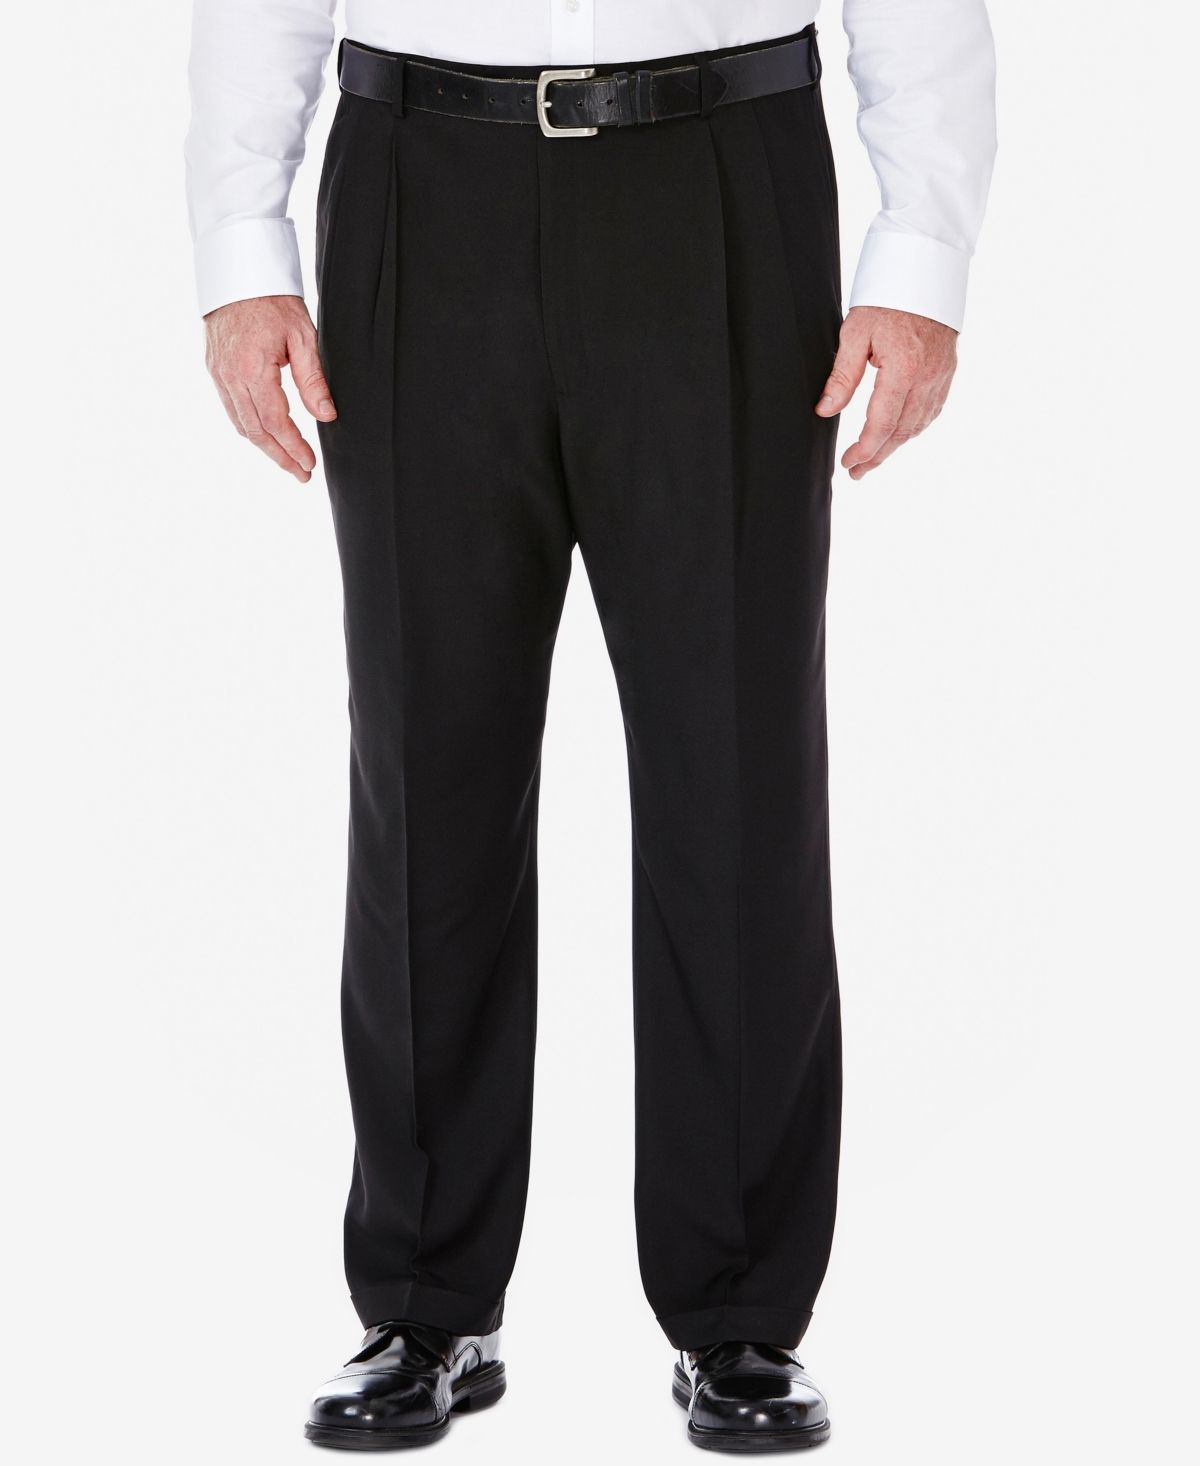 Haggar Men S Big Tall Eclo Stria Classic Fit Pleated Hidden Expandable Waistband Dress Pants Reviews Pants Men Macy S In 2021 Waistband Dress Dress Pants Mens Big And Tall [ 1466 x 1200 Pixel ]